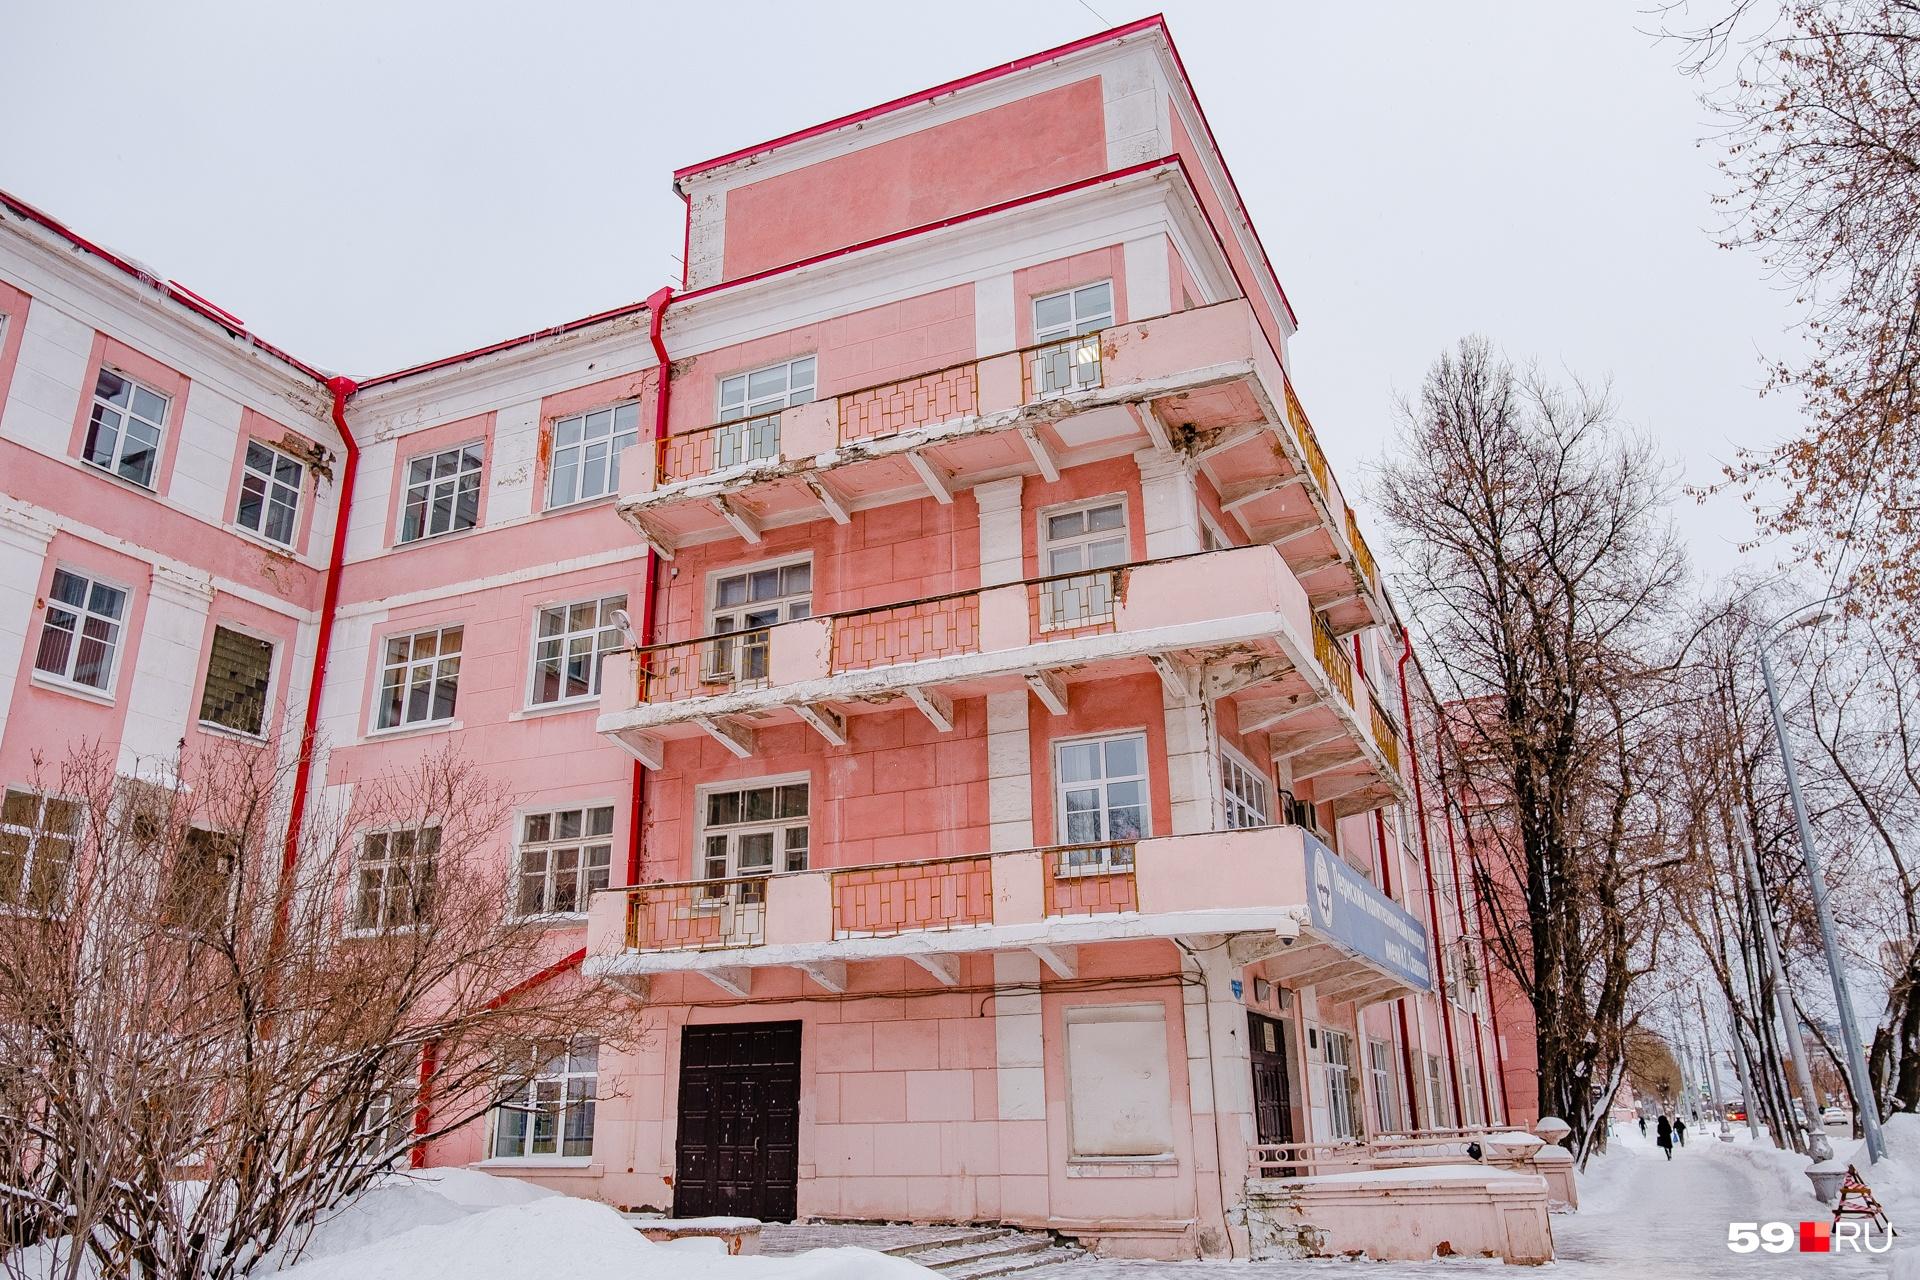 Углы техникума украшены балконами